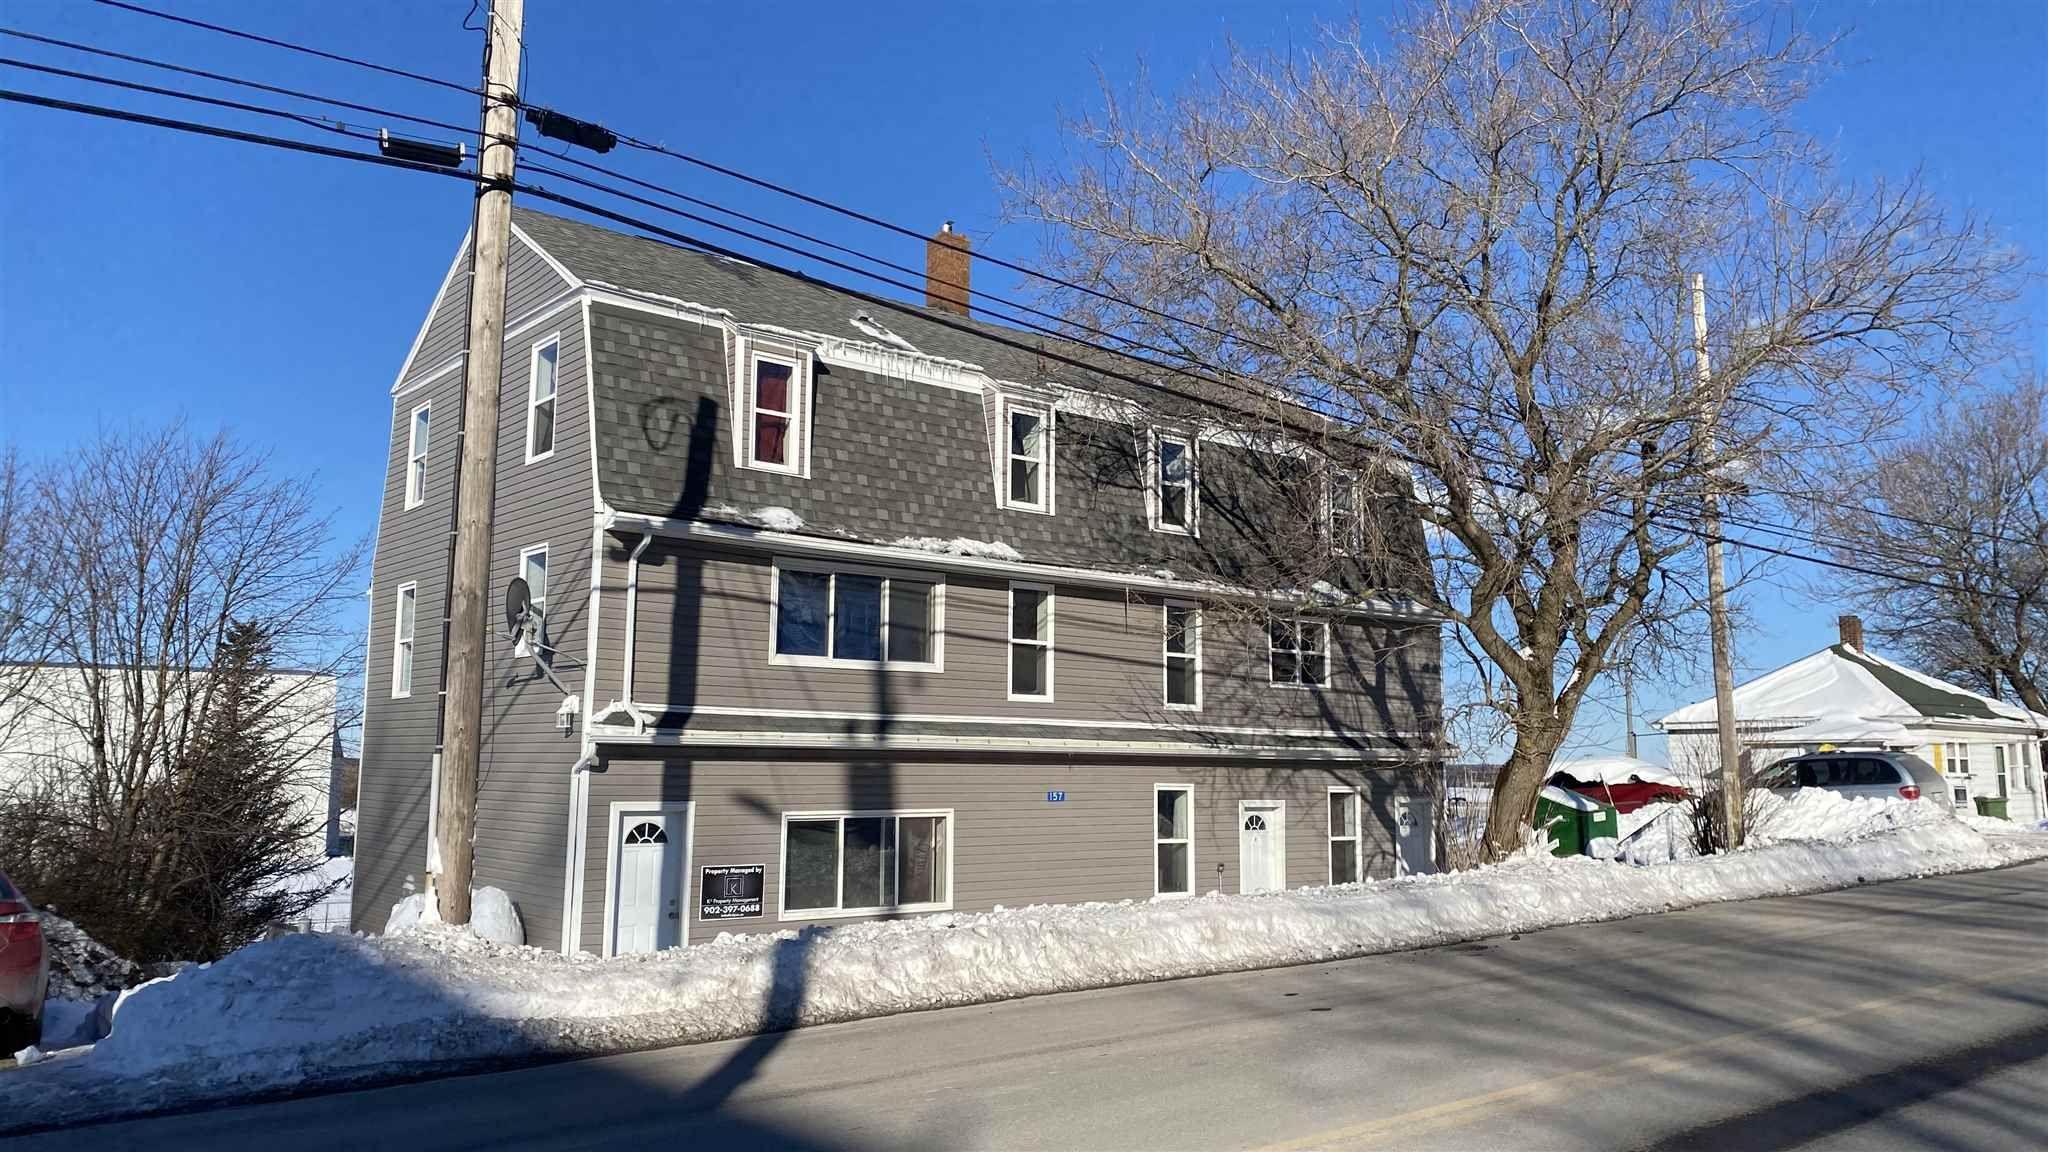 Main Photo: 157 MAIN Street in Trenton: 107-Trenton,Westville,Pictou Multi-Family for sale (Northern Region)  : MLS®# 202102543